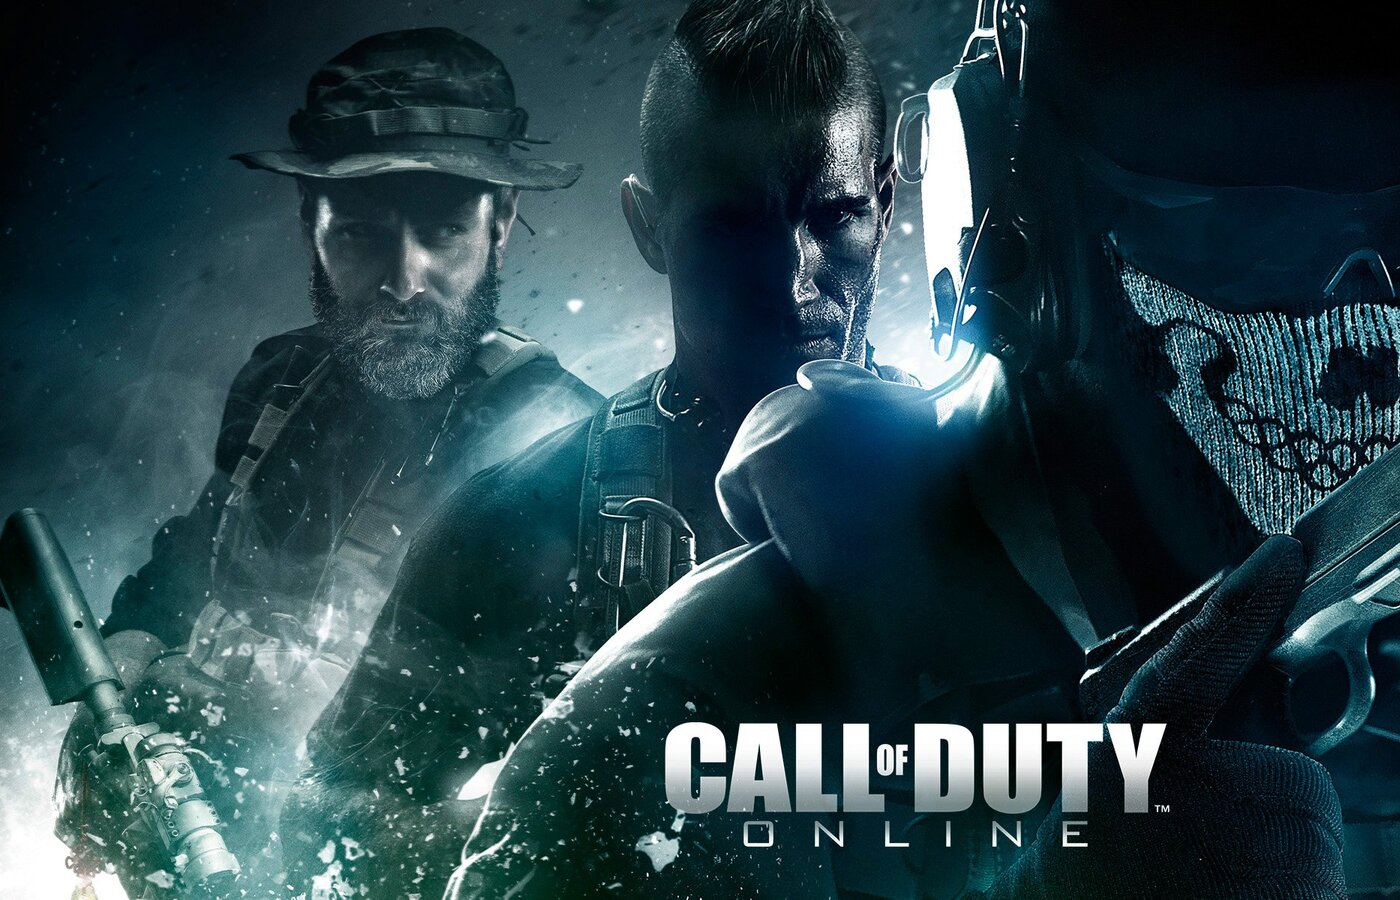 call-of-duty-online-game.jpg